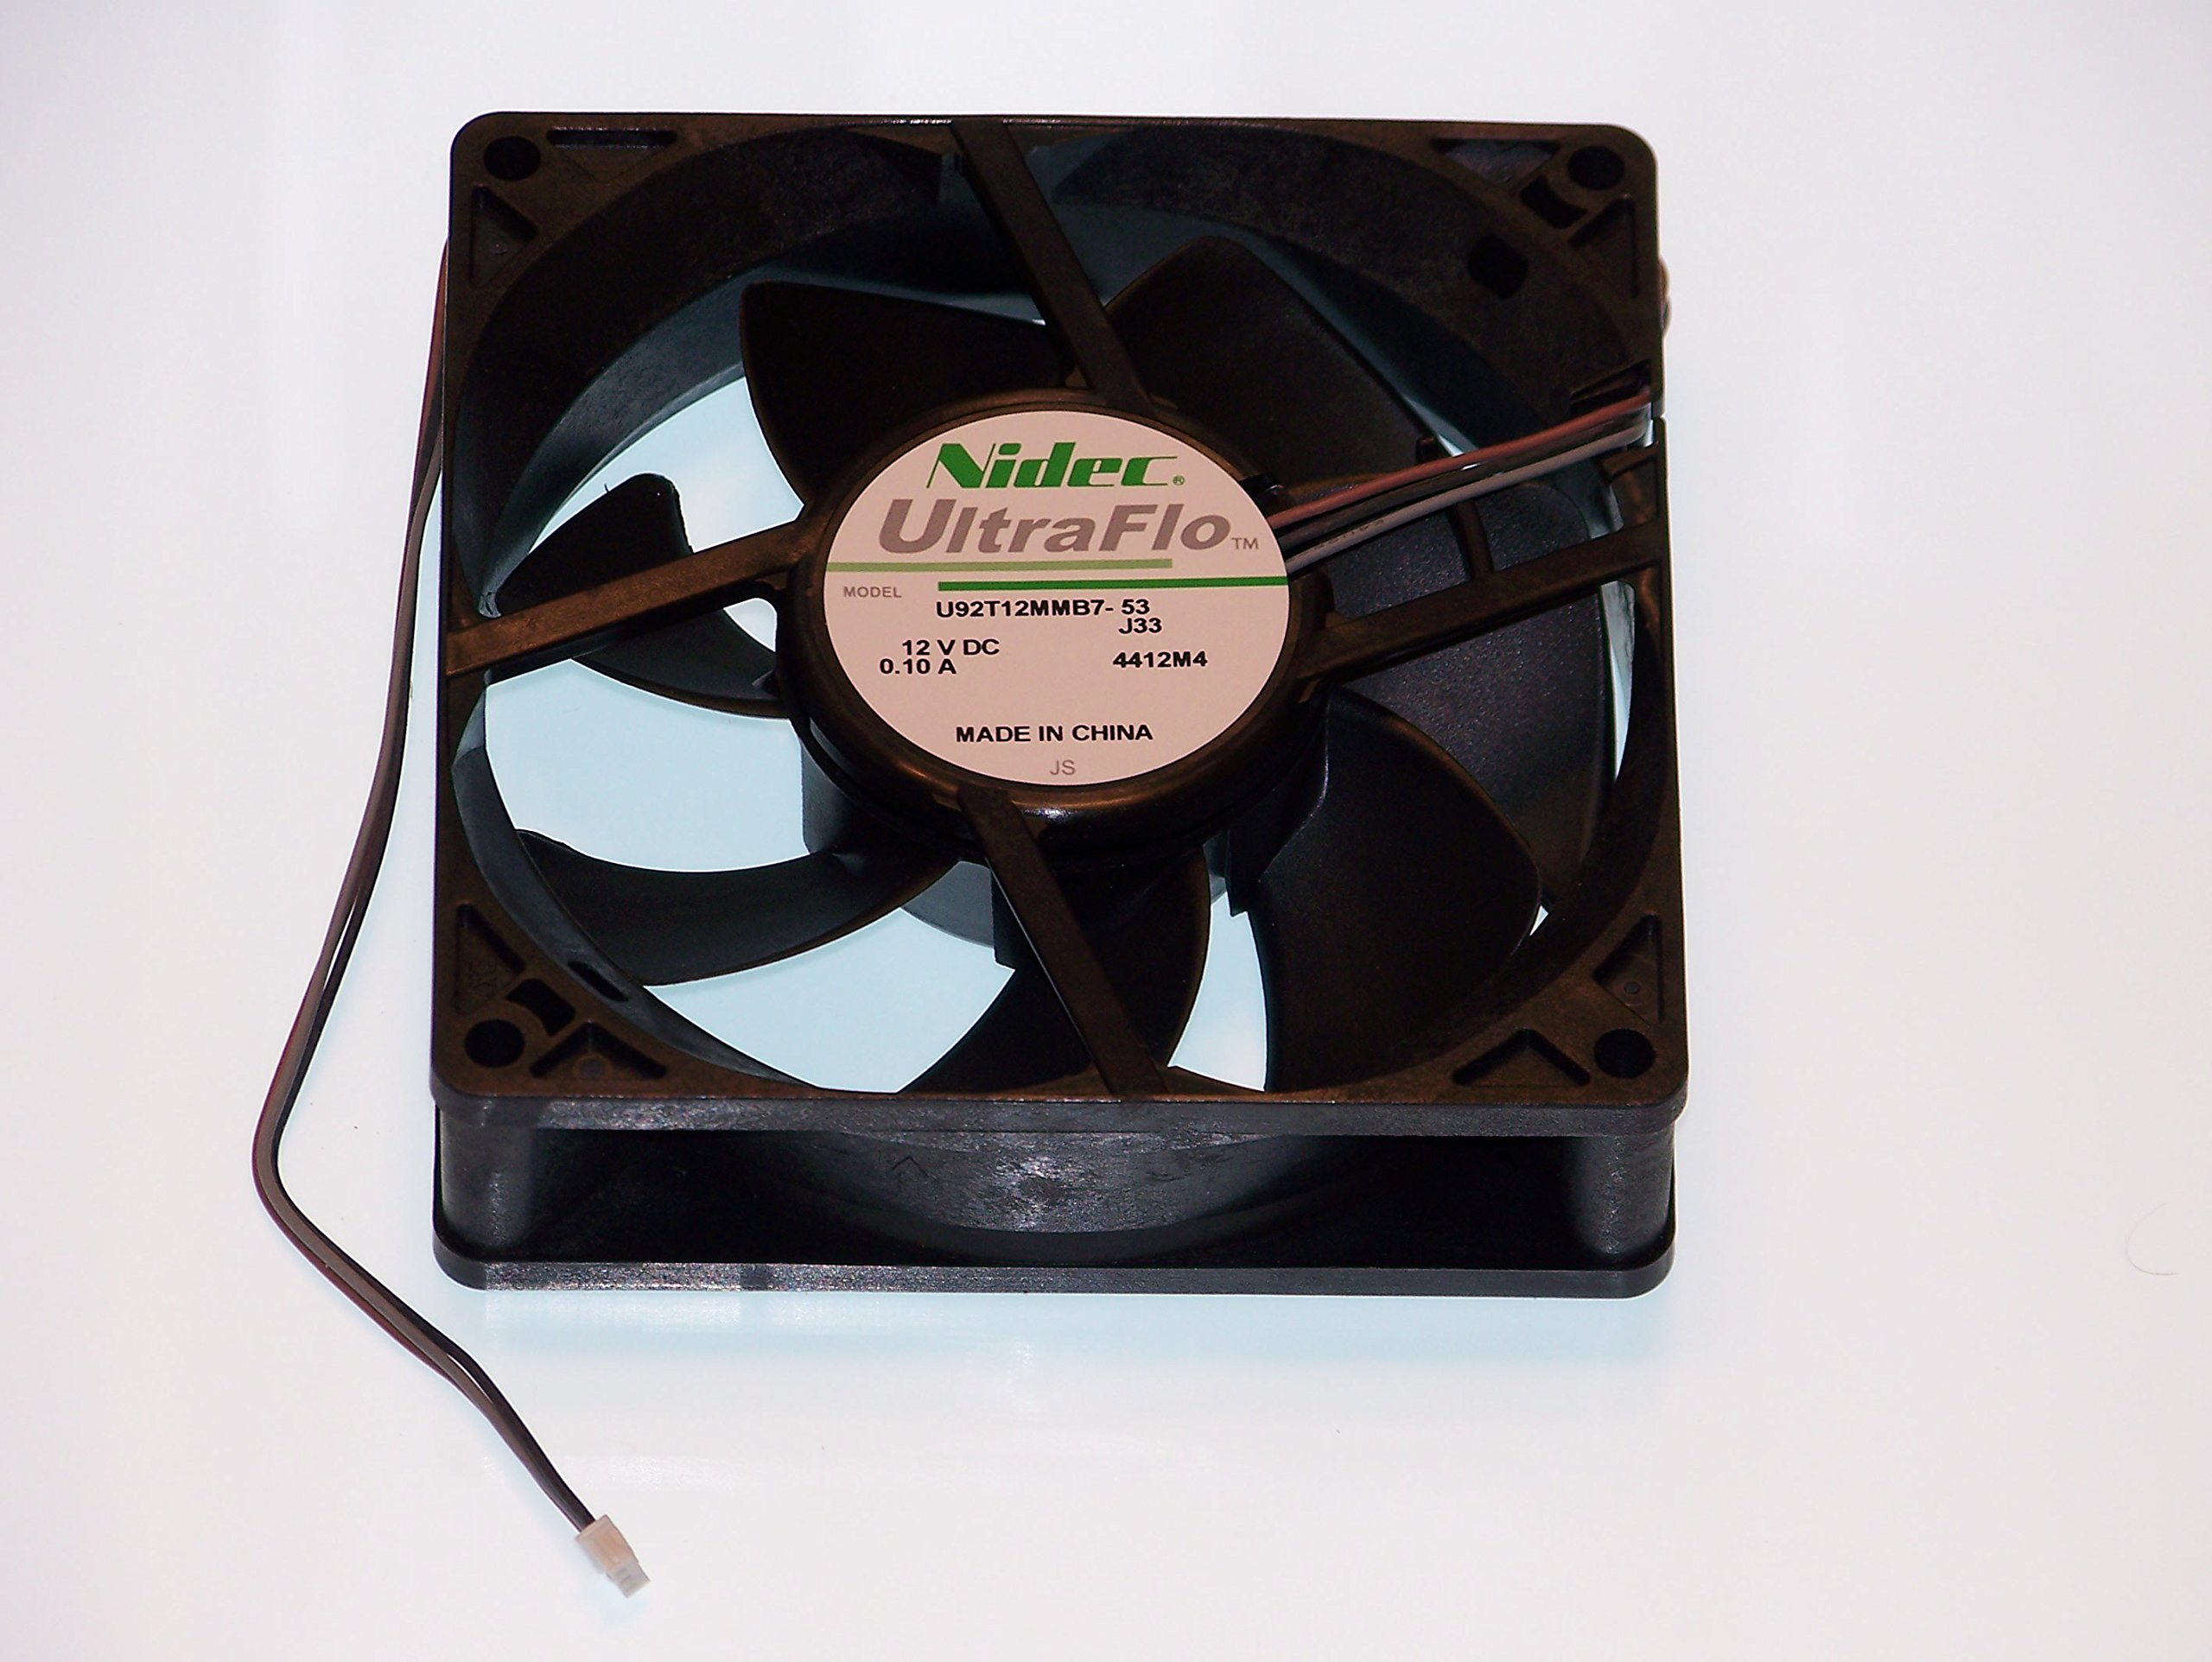 OEM Epson Exhaust Fan Specifically For PowerLite Home Cinema 6100, 6500 UB, 8100, 8345, 8350, 8500 UB, 8700 UB by Epson